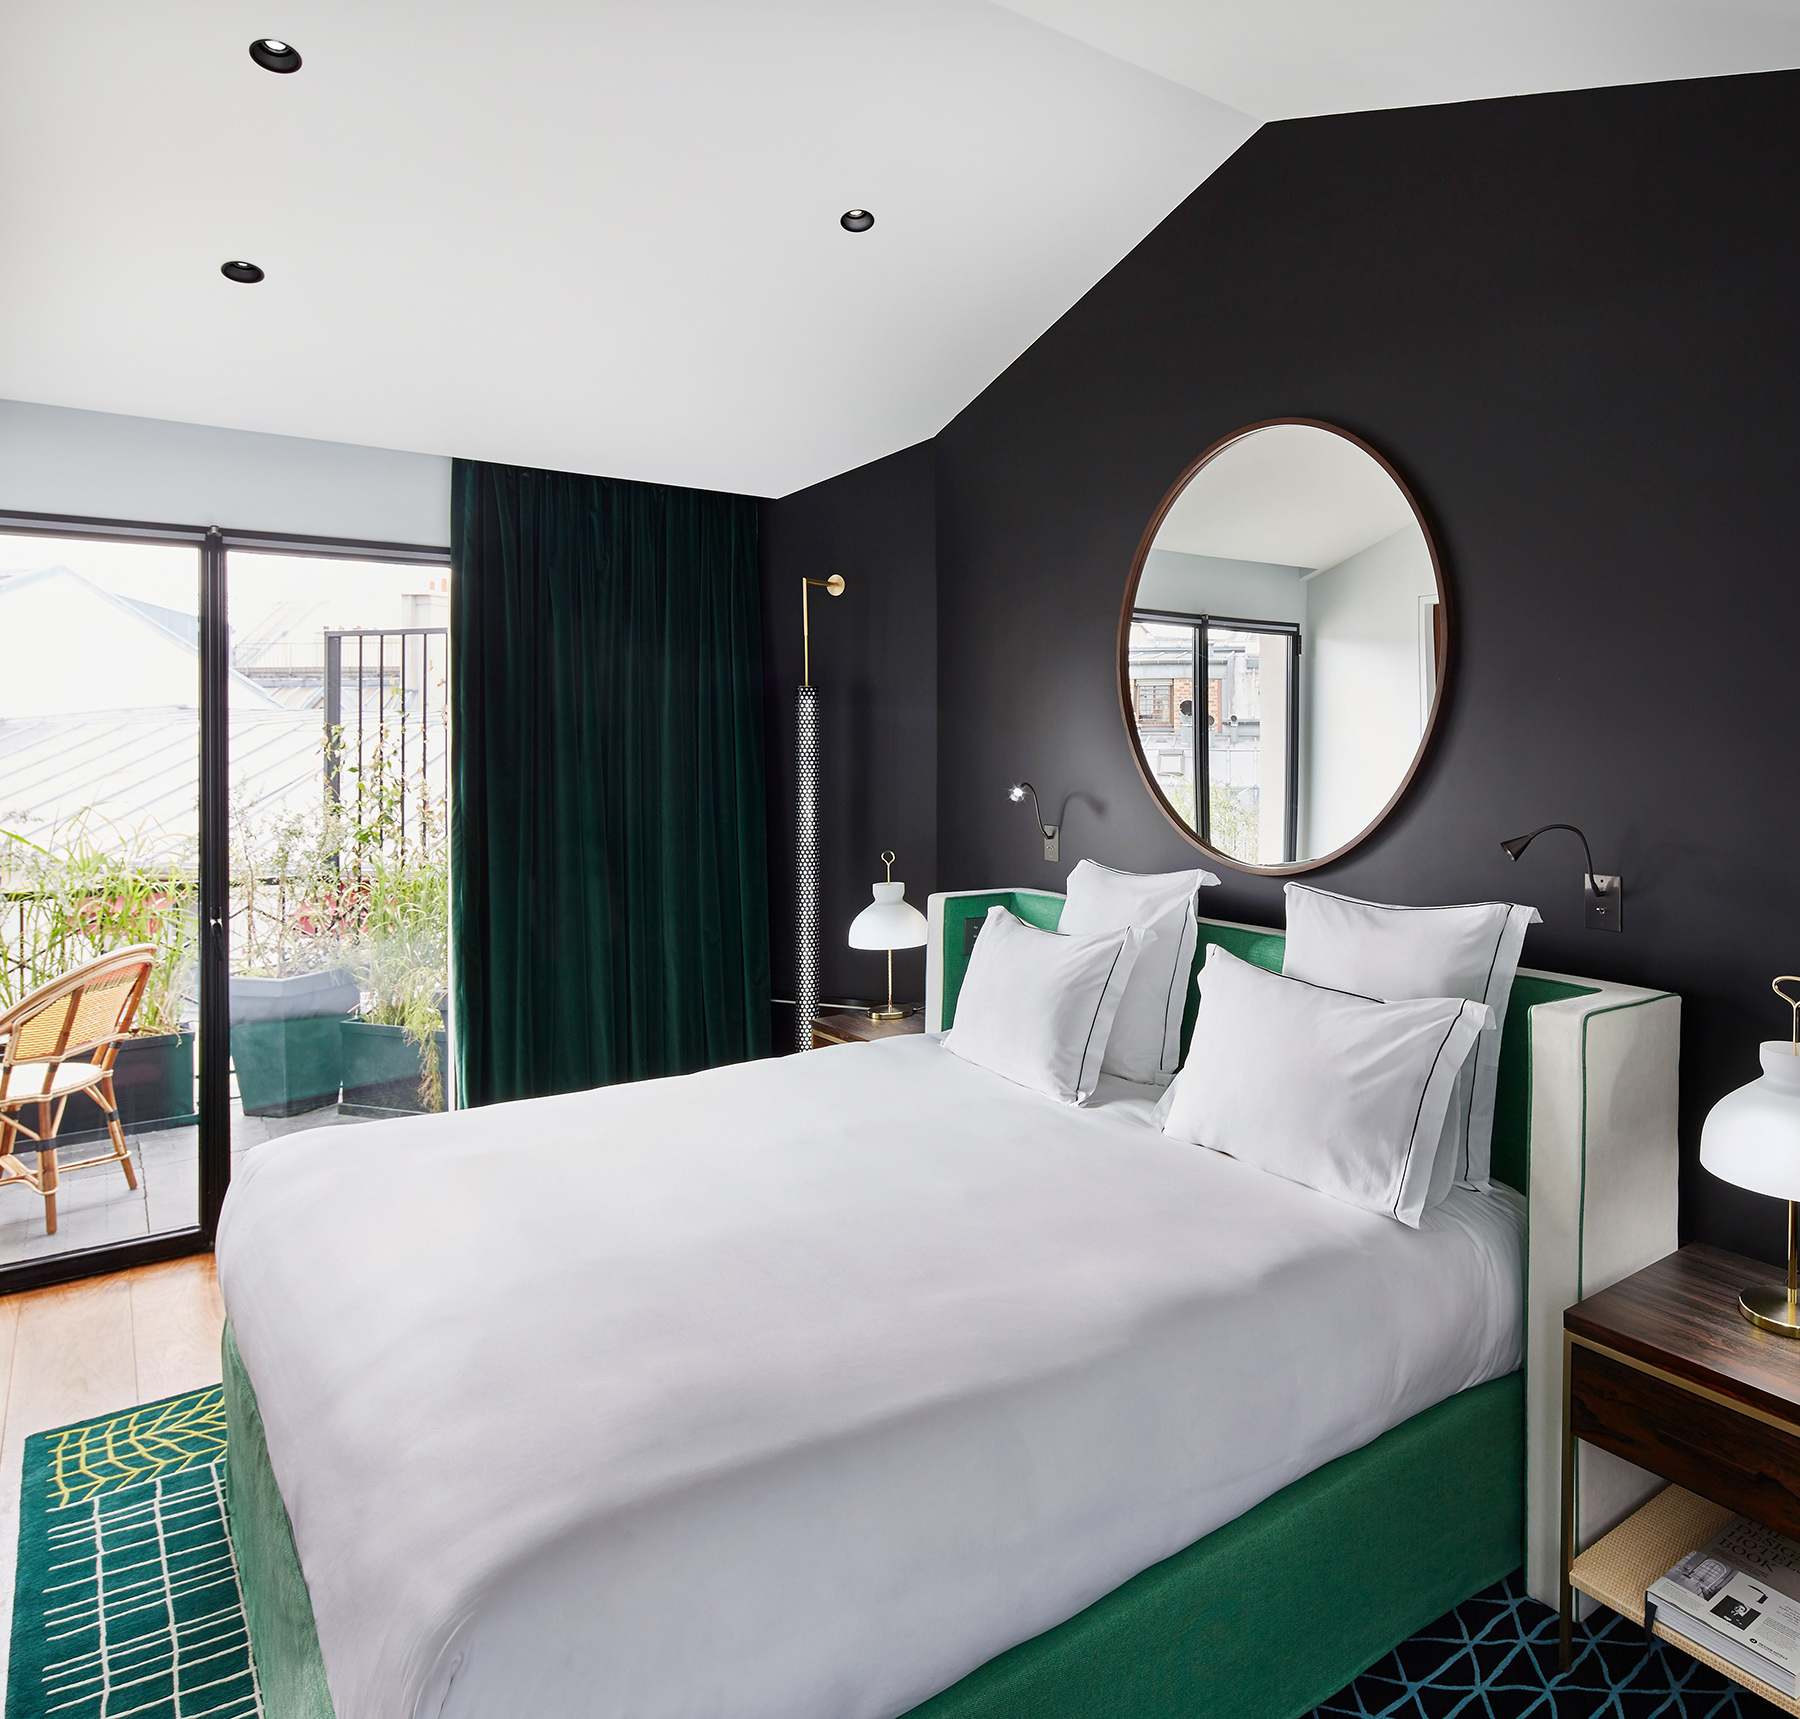 le-roch-hotel-and-spa-suite-saint-roch-R-r.jpg